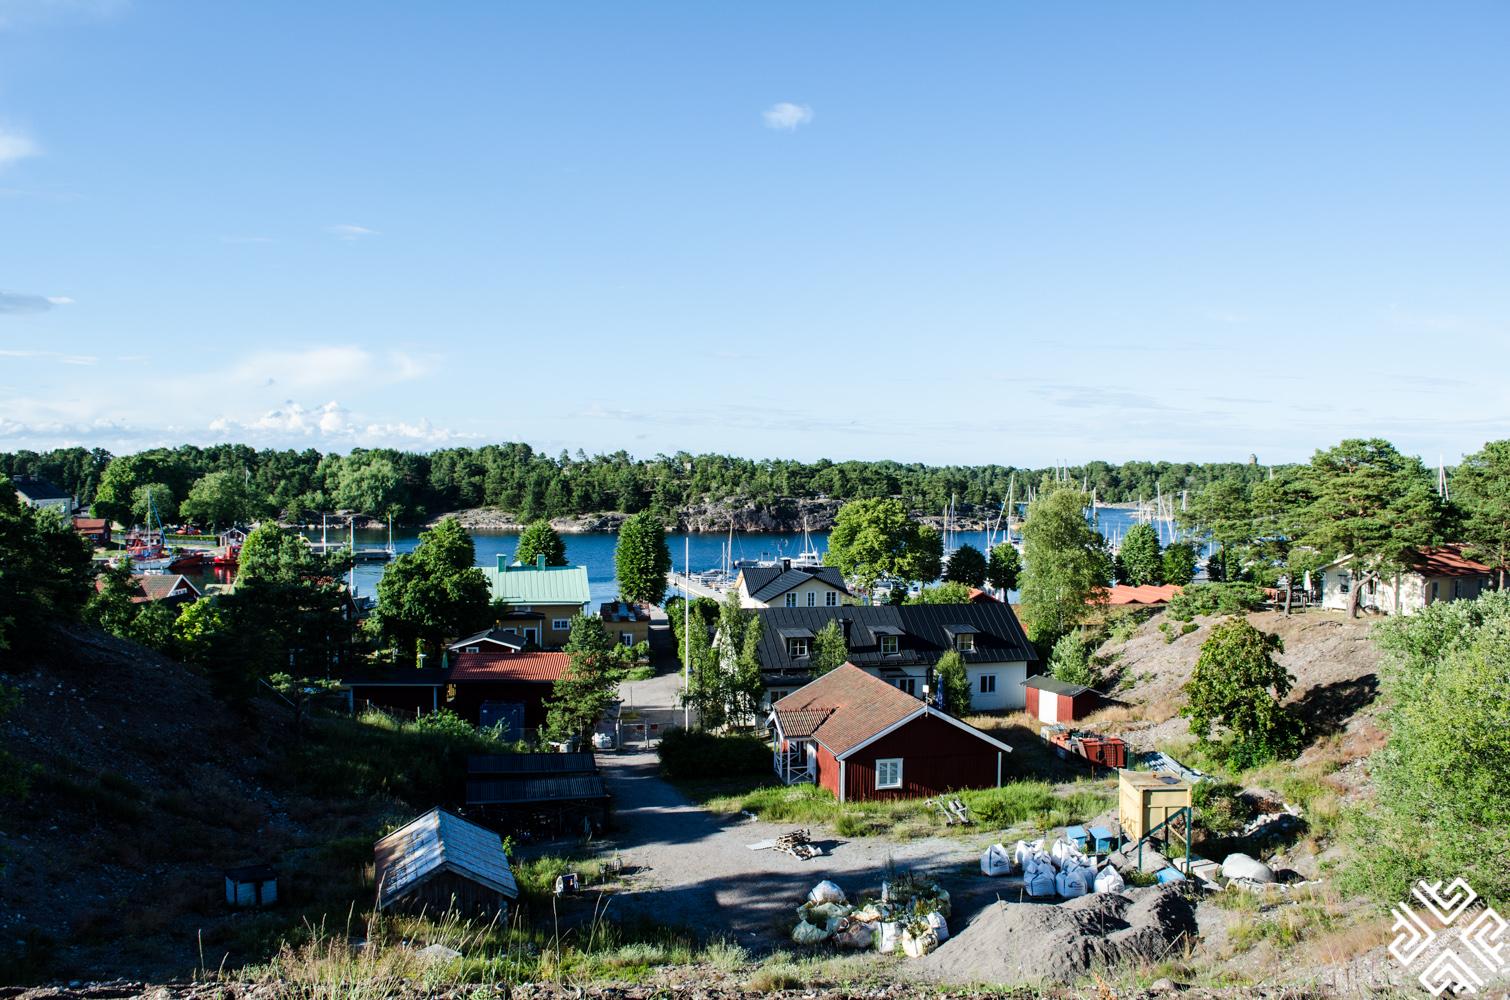 stockholm_archipelago_sandhamn-8